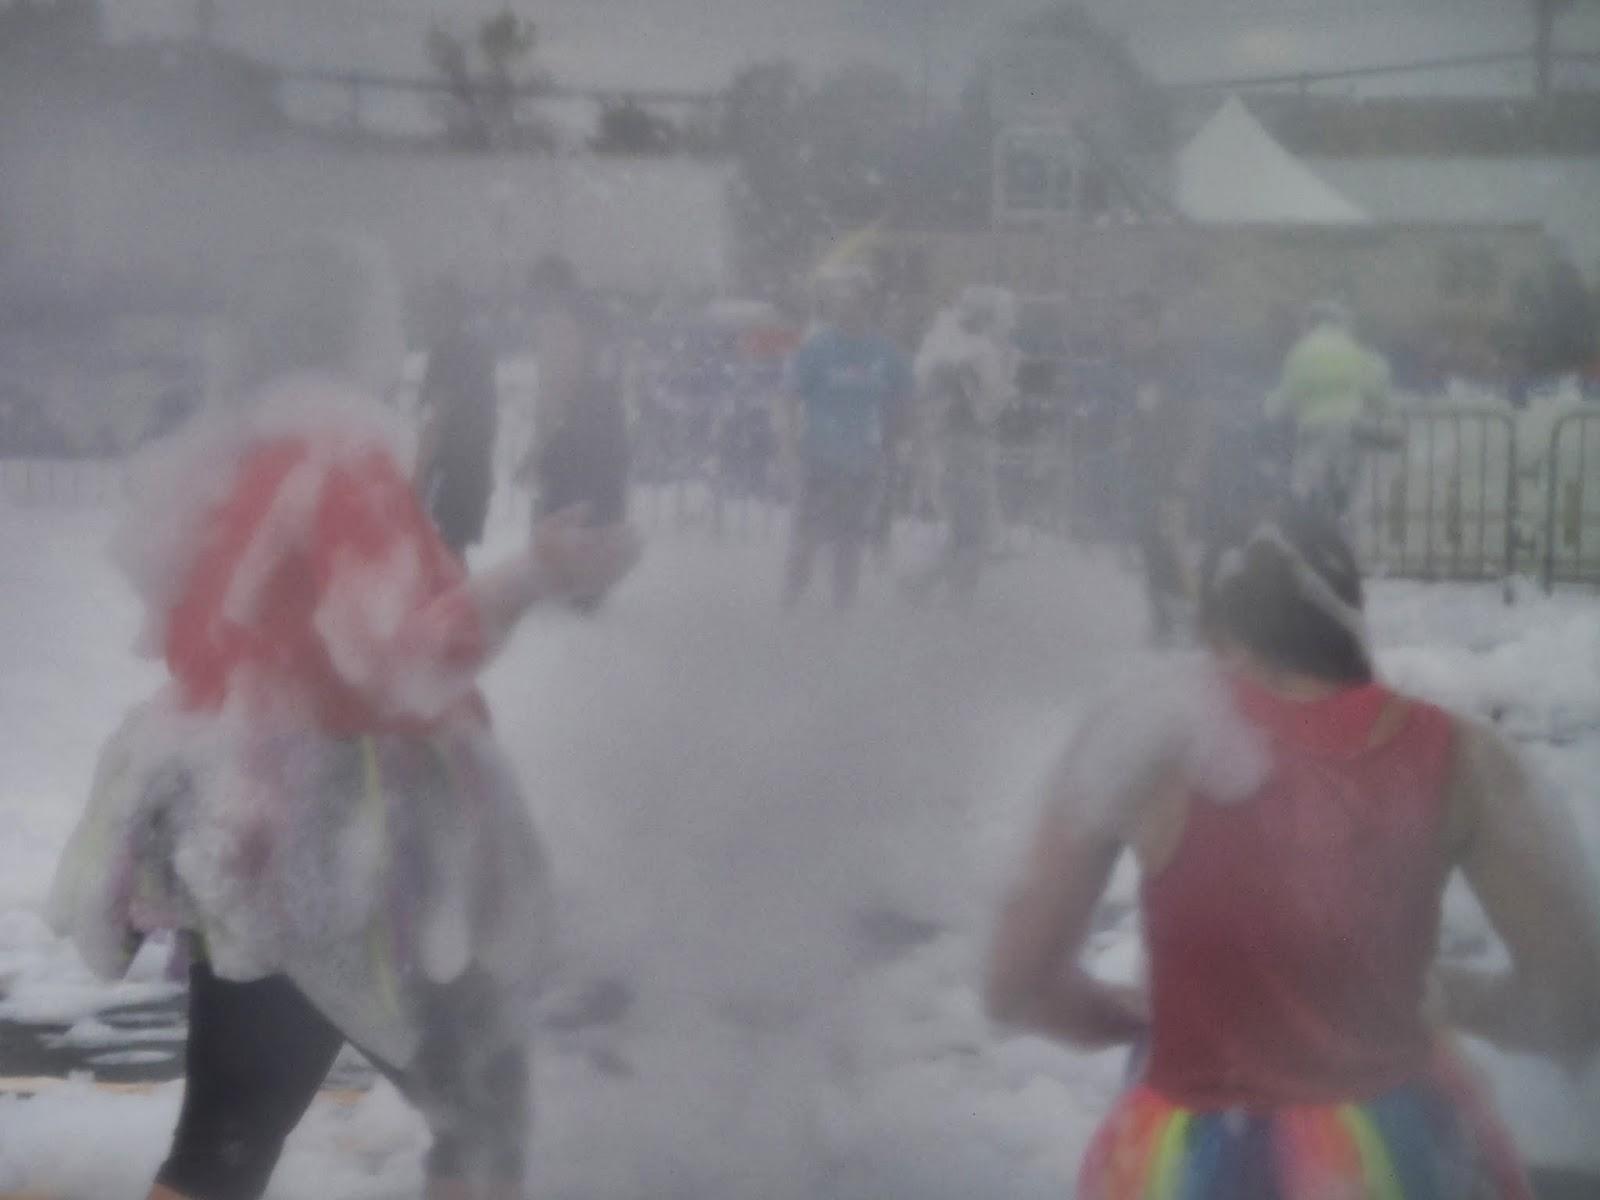 Ridiculous obstacle race foam machine